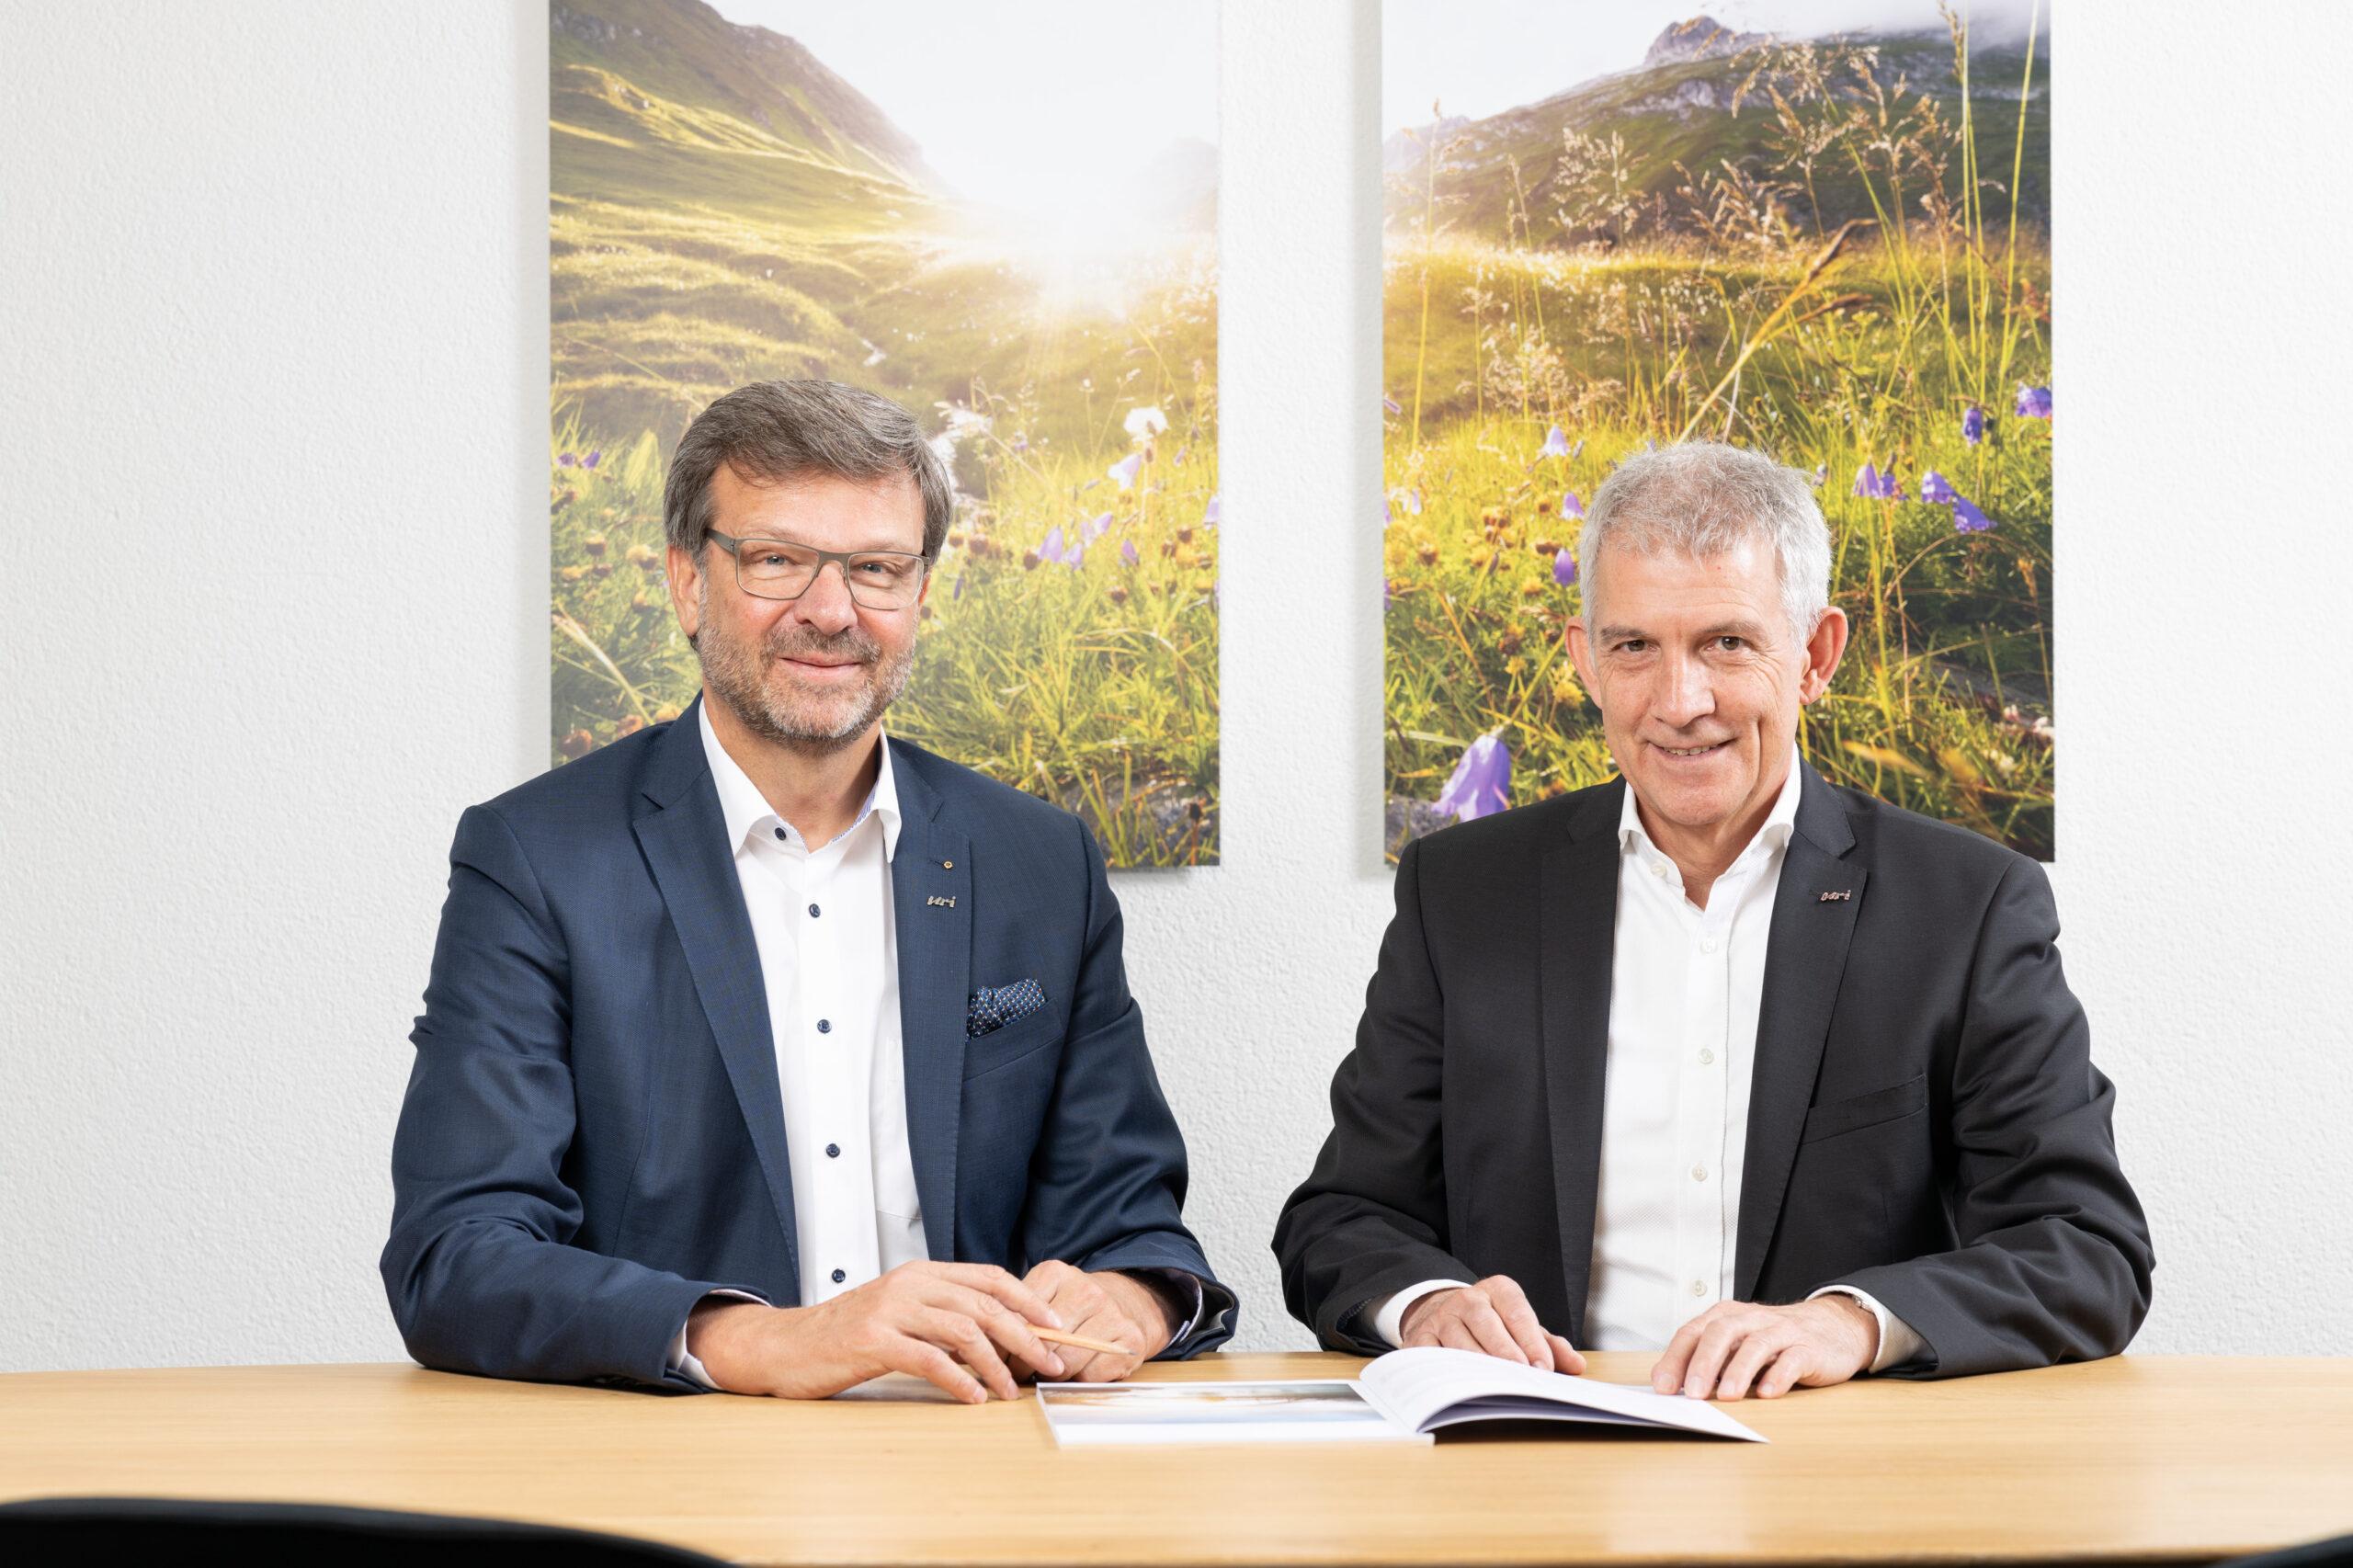 Meier & Kamer Werbefotografie und Businessfotografie: Geschäftsbericht CEO-Fotos Urner Kantonalbank